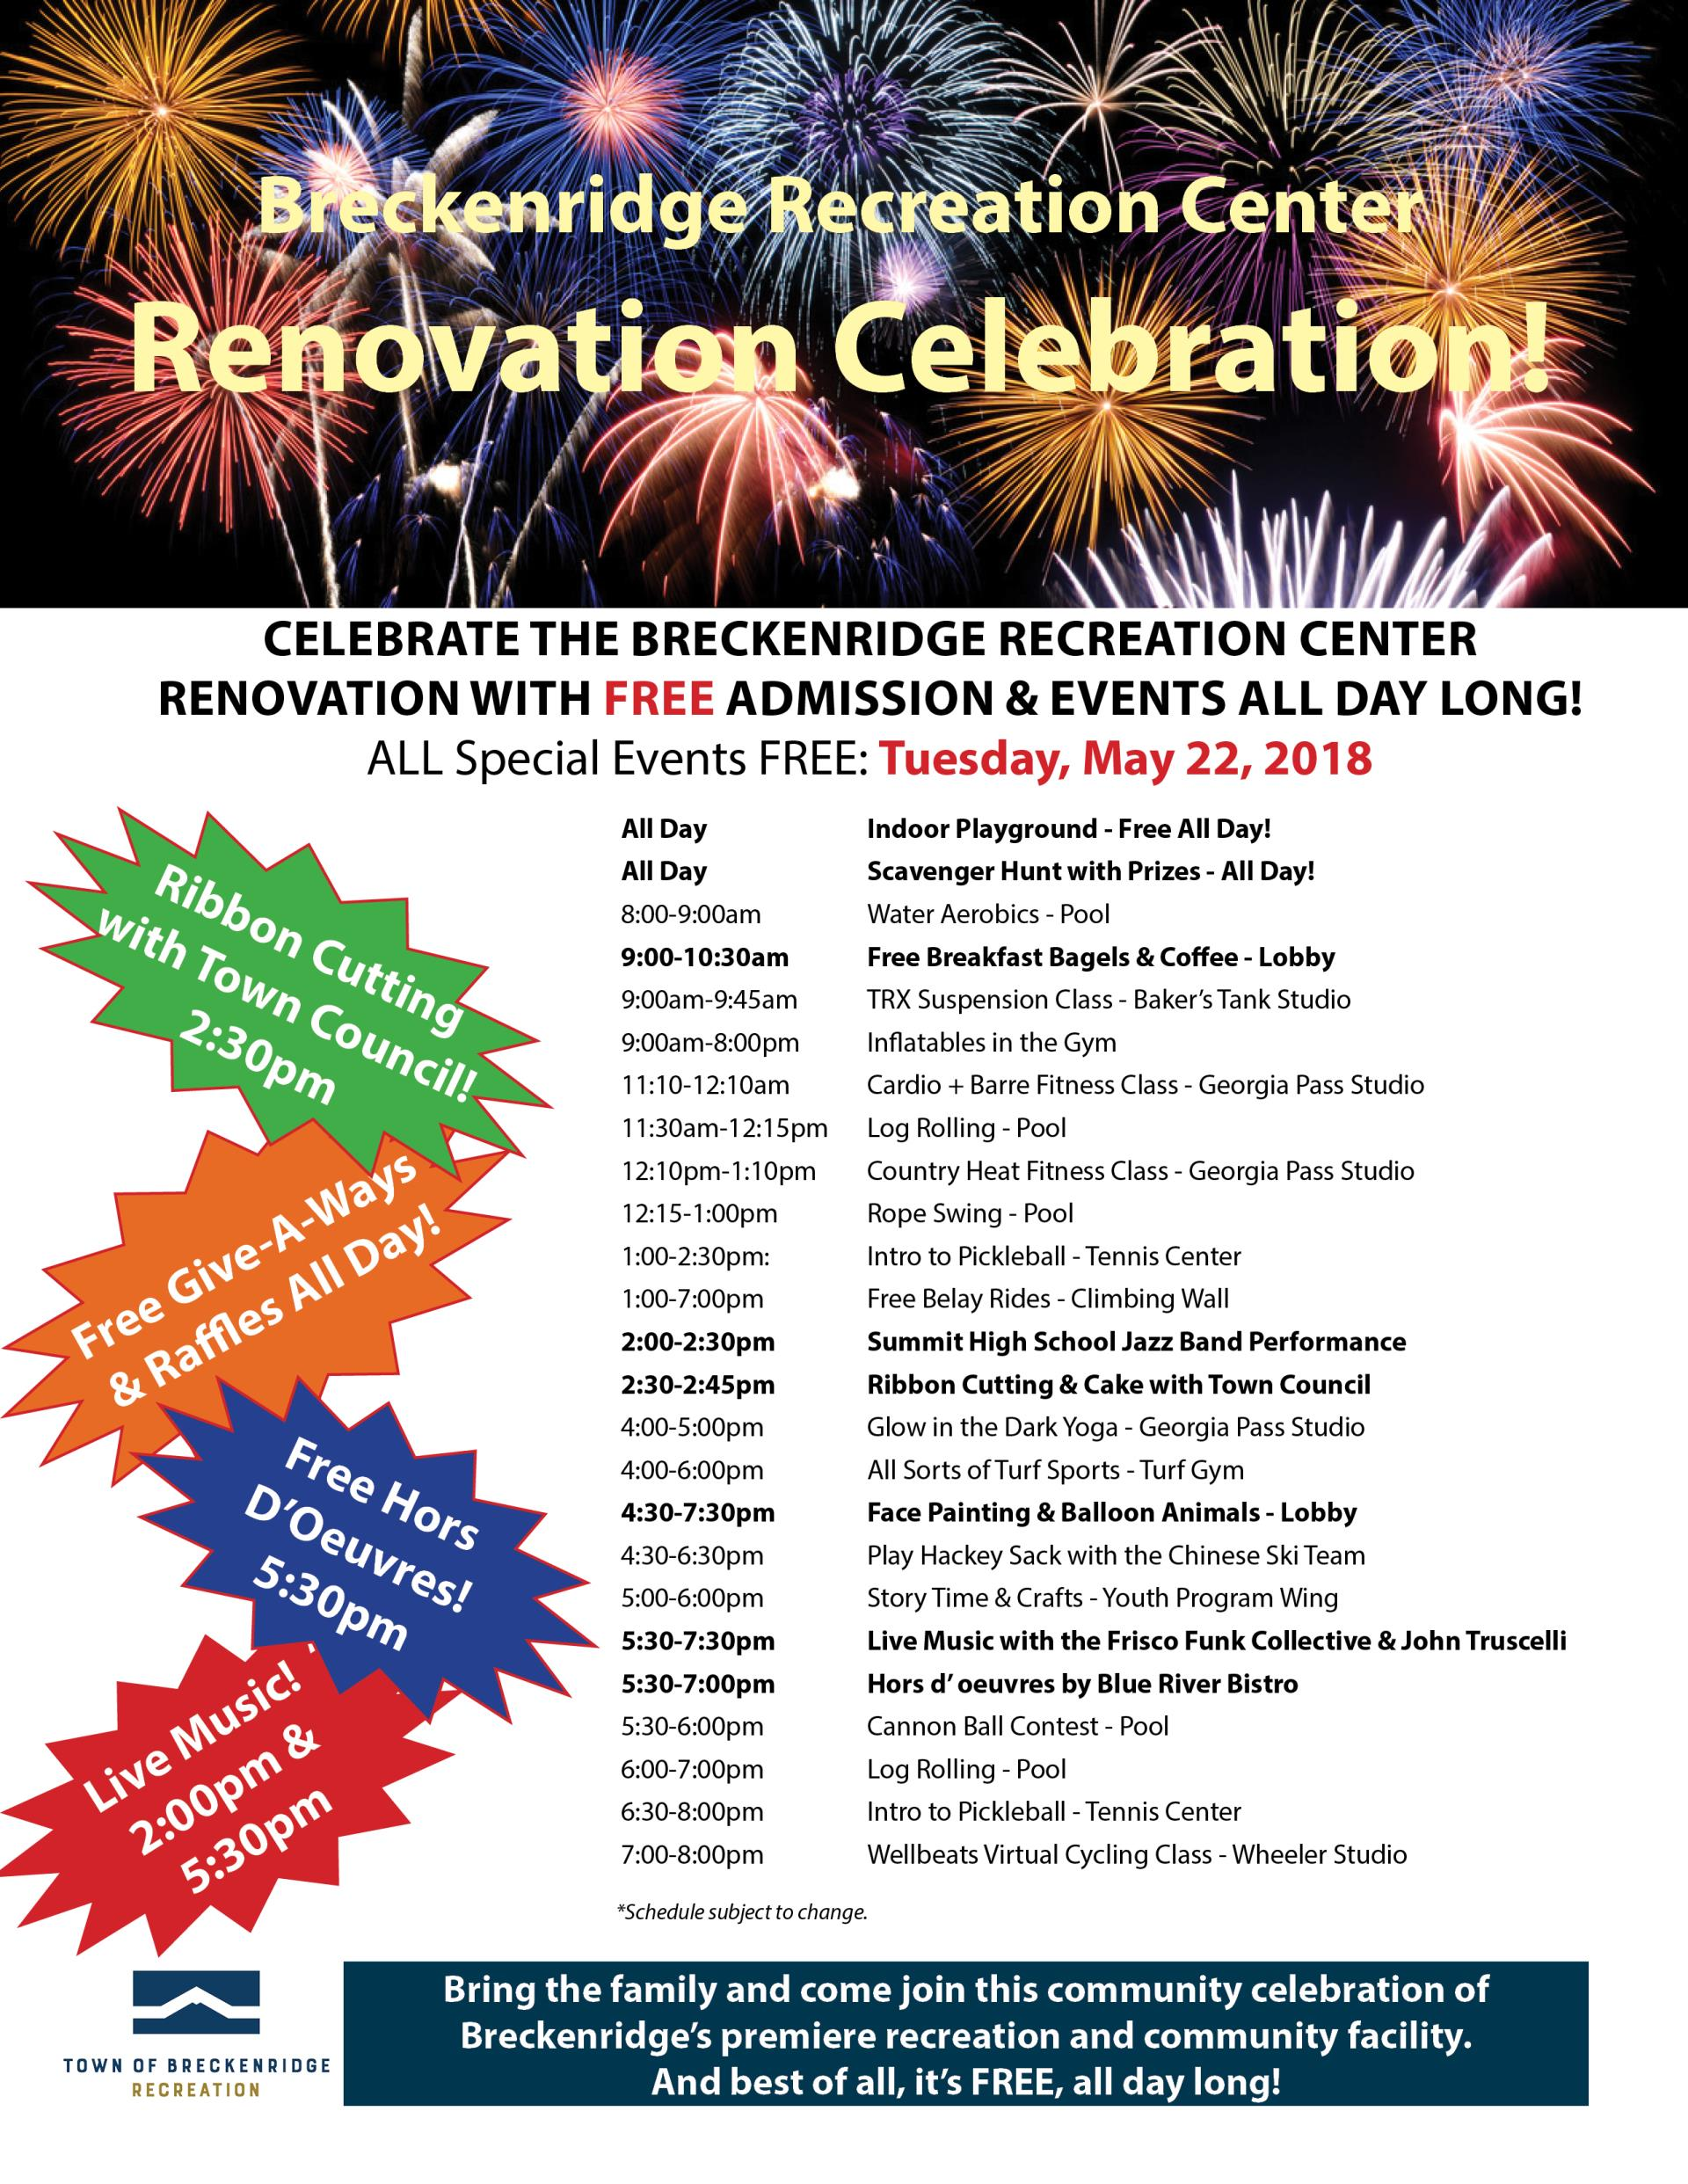 Recreation Celebration | Breckenridge Recreation